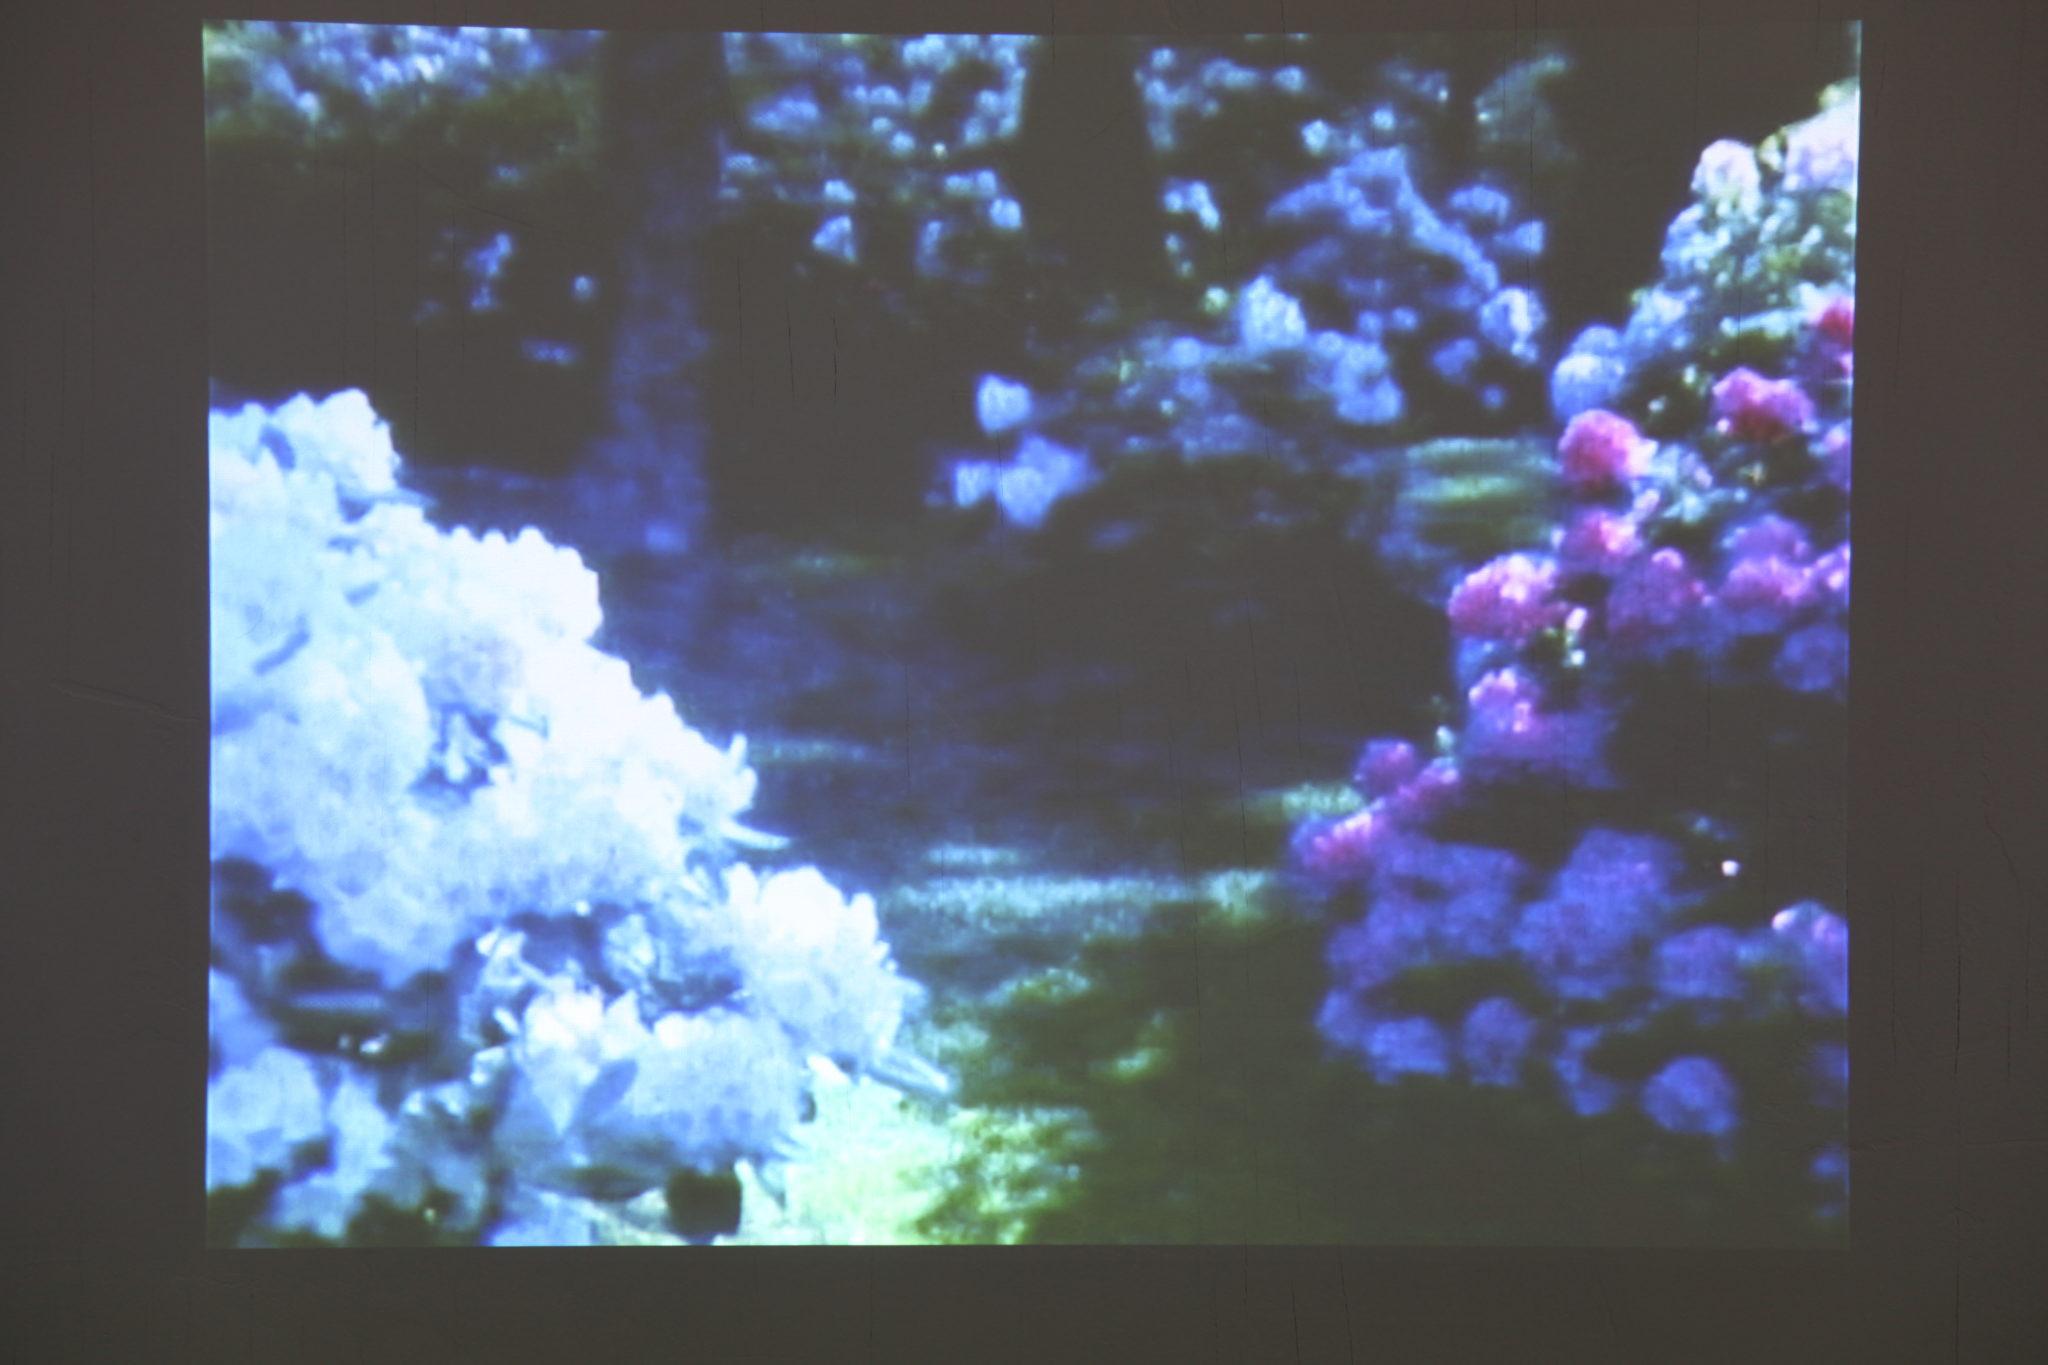 The Other Side, Super 8 film, digitalized